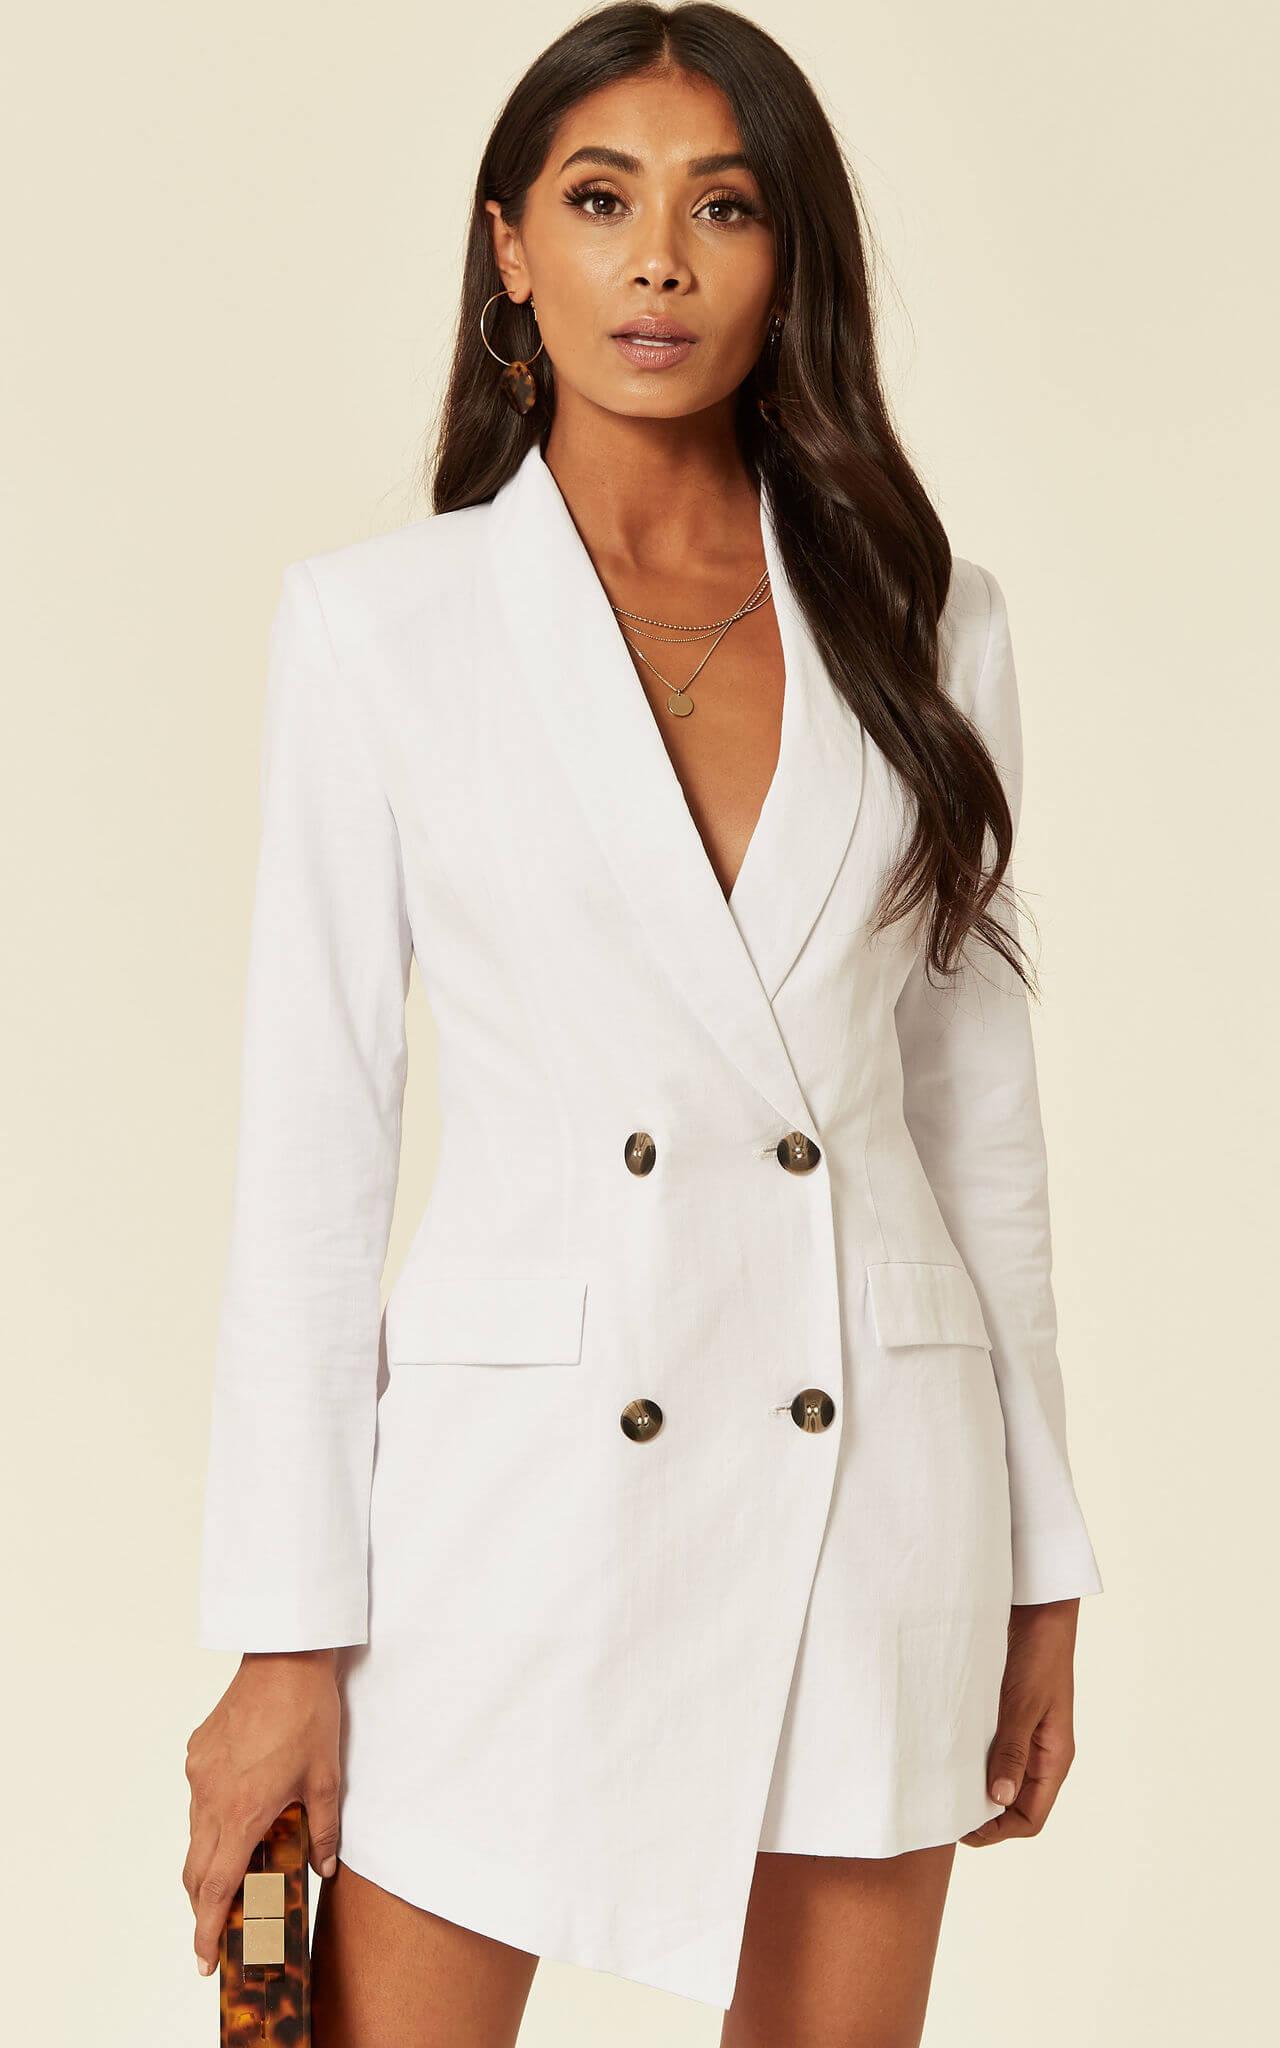 Model wears double breasted white cotton blazer dress in white